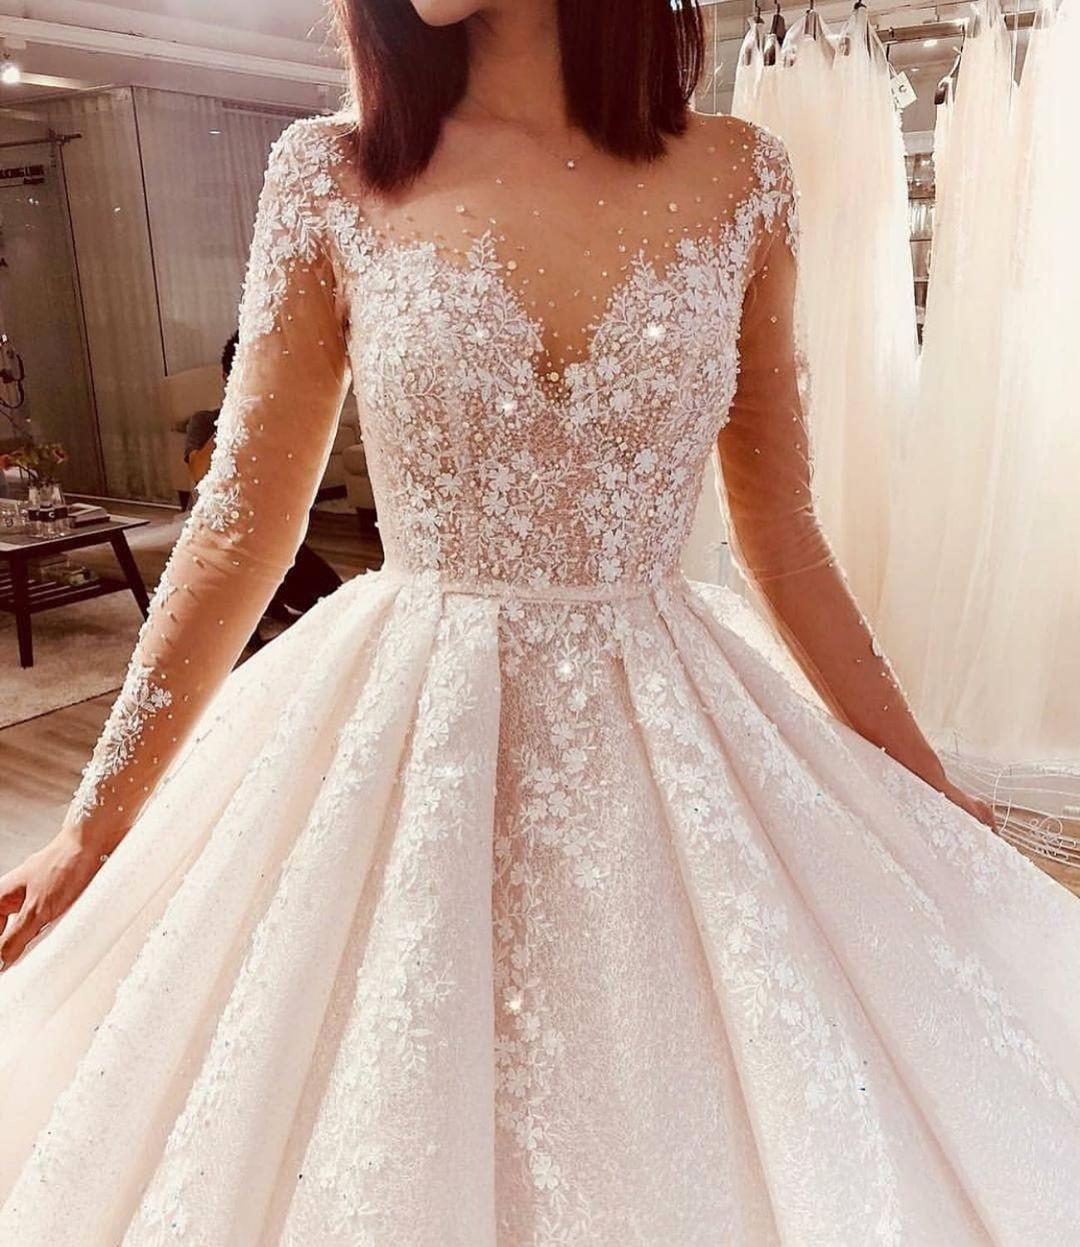 Wedding dress bling Elegant Long Sleeve Wedding Gown with Pearls and Rhinestones